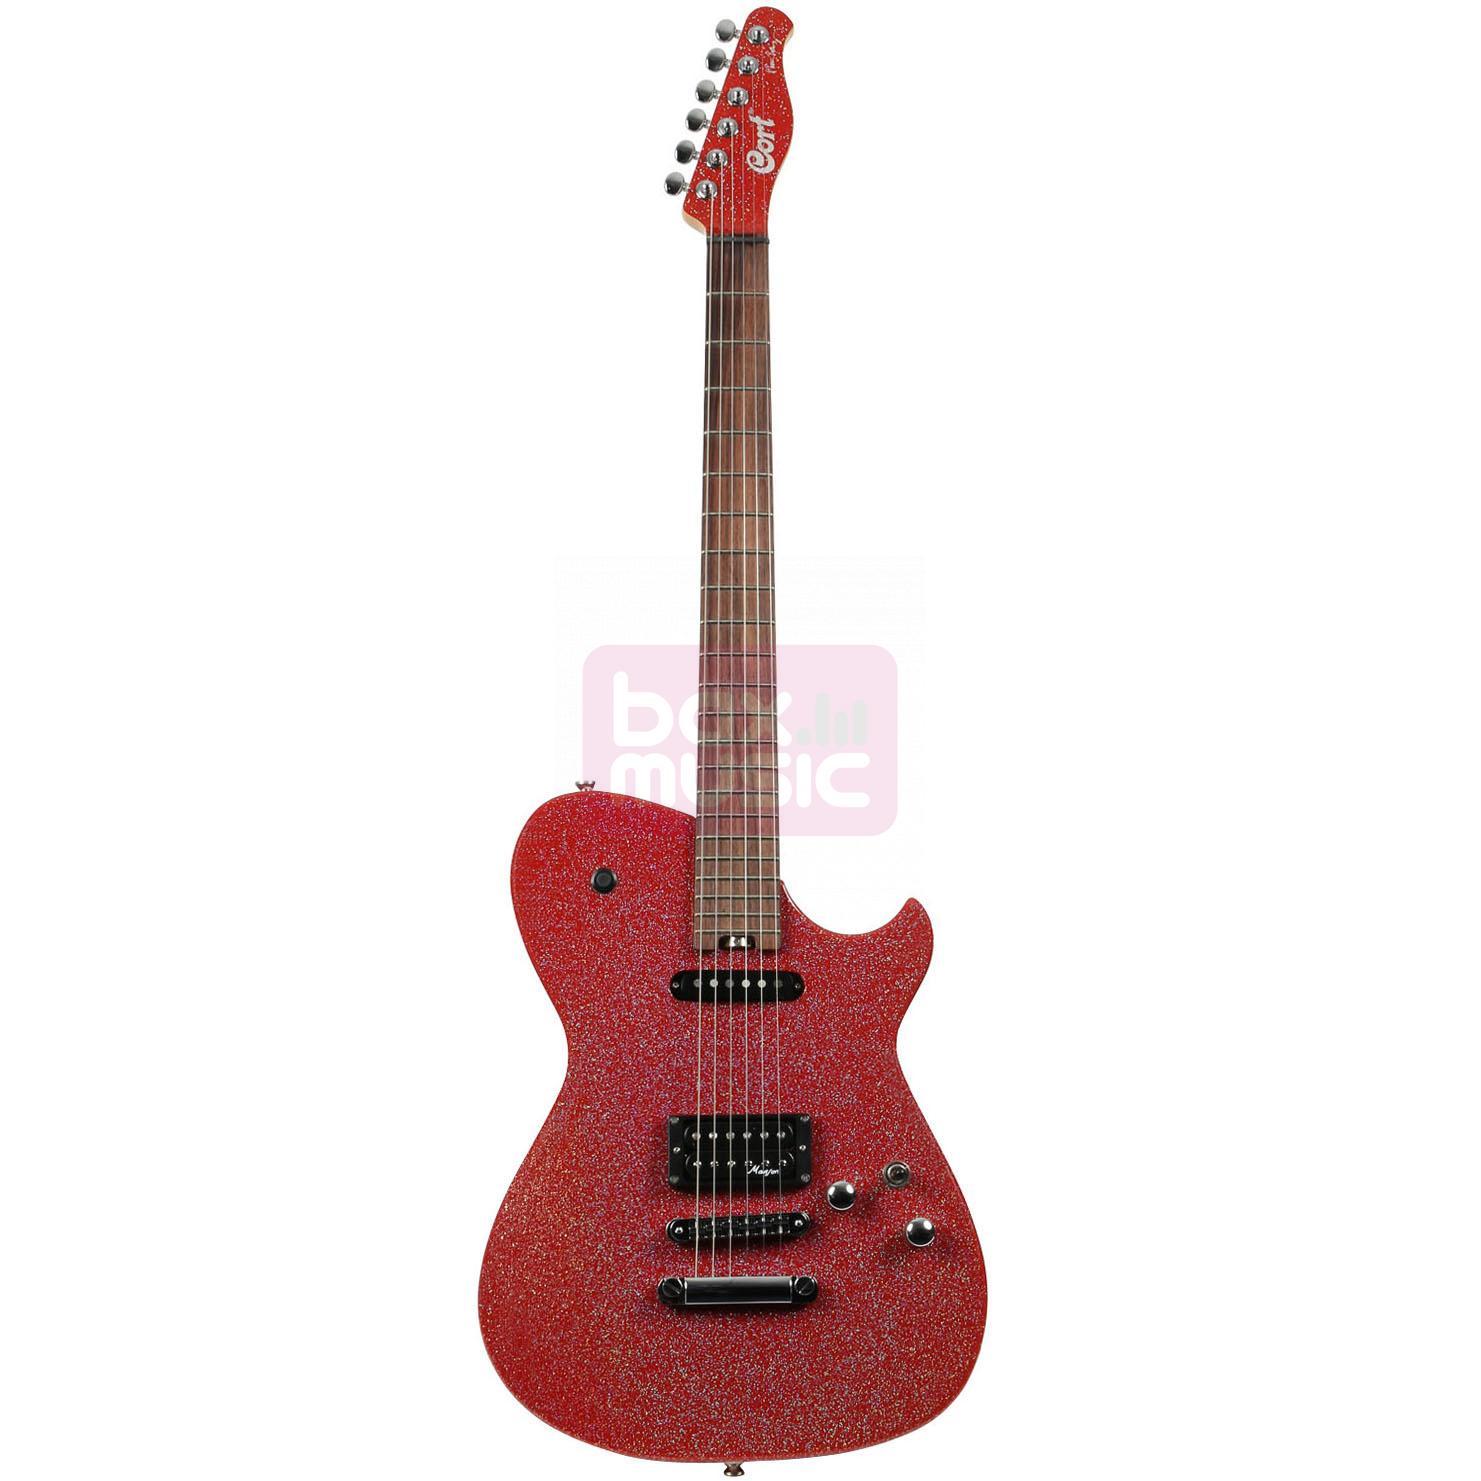 Cort MBC-1 RS Matthew Bellamy Red Sparkle elektrische gitaar